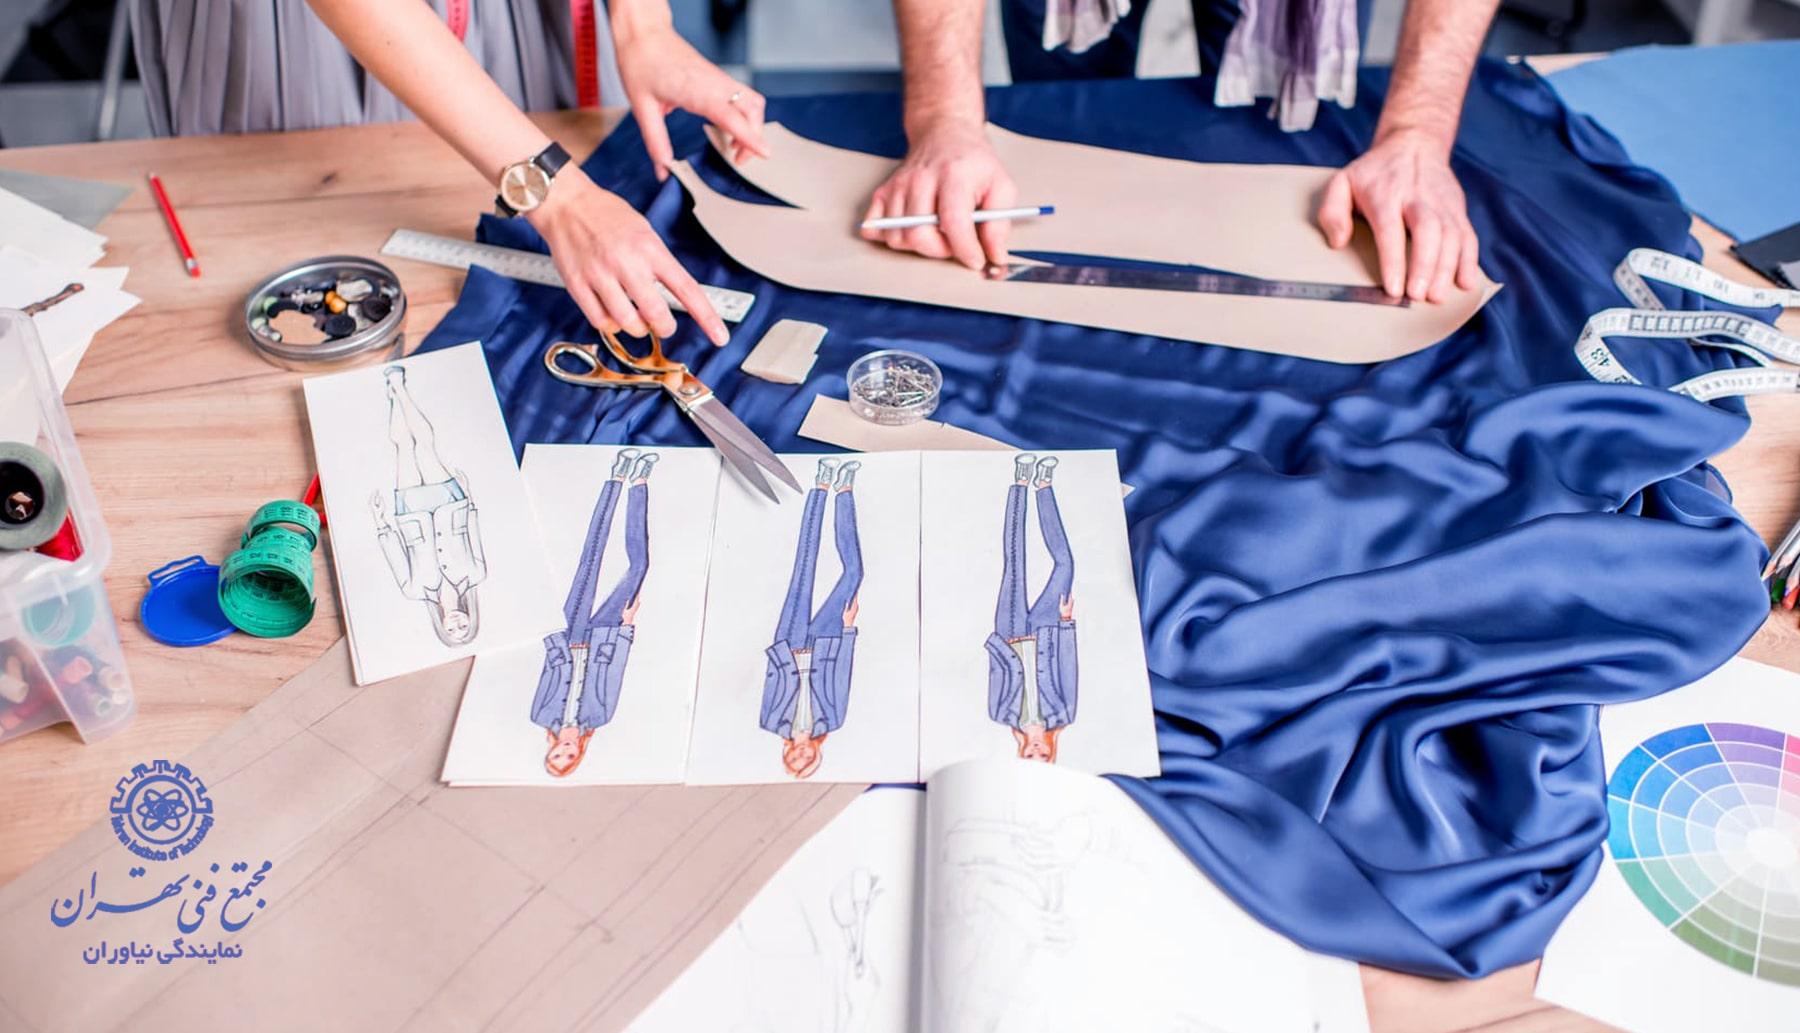 چگونه طراح لباس شویم